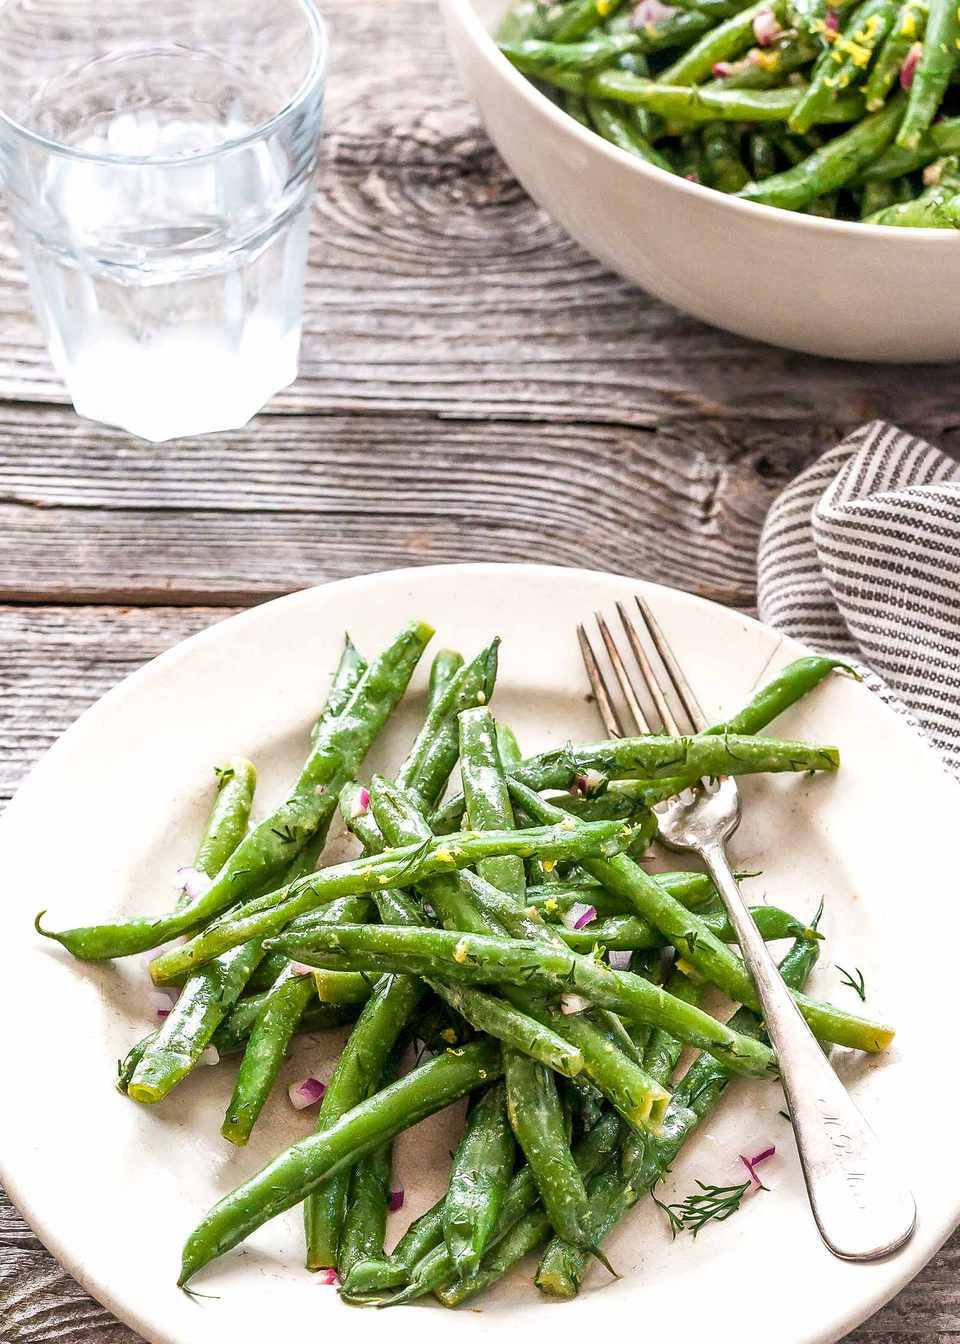 Garden Green Bean Salad - green beans on a plate with a fork